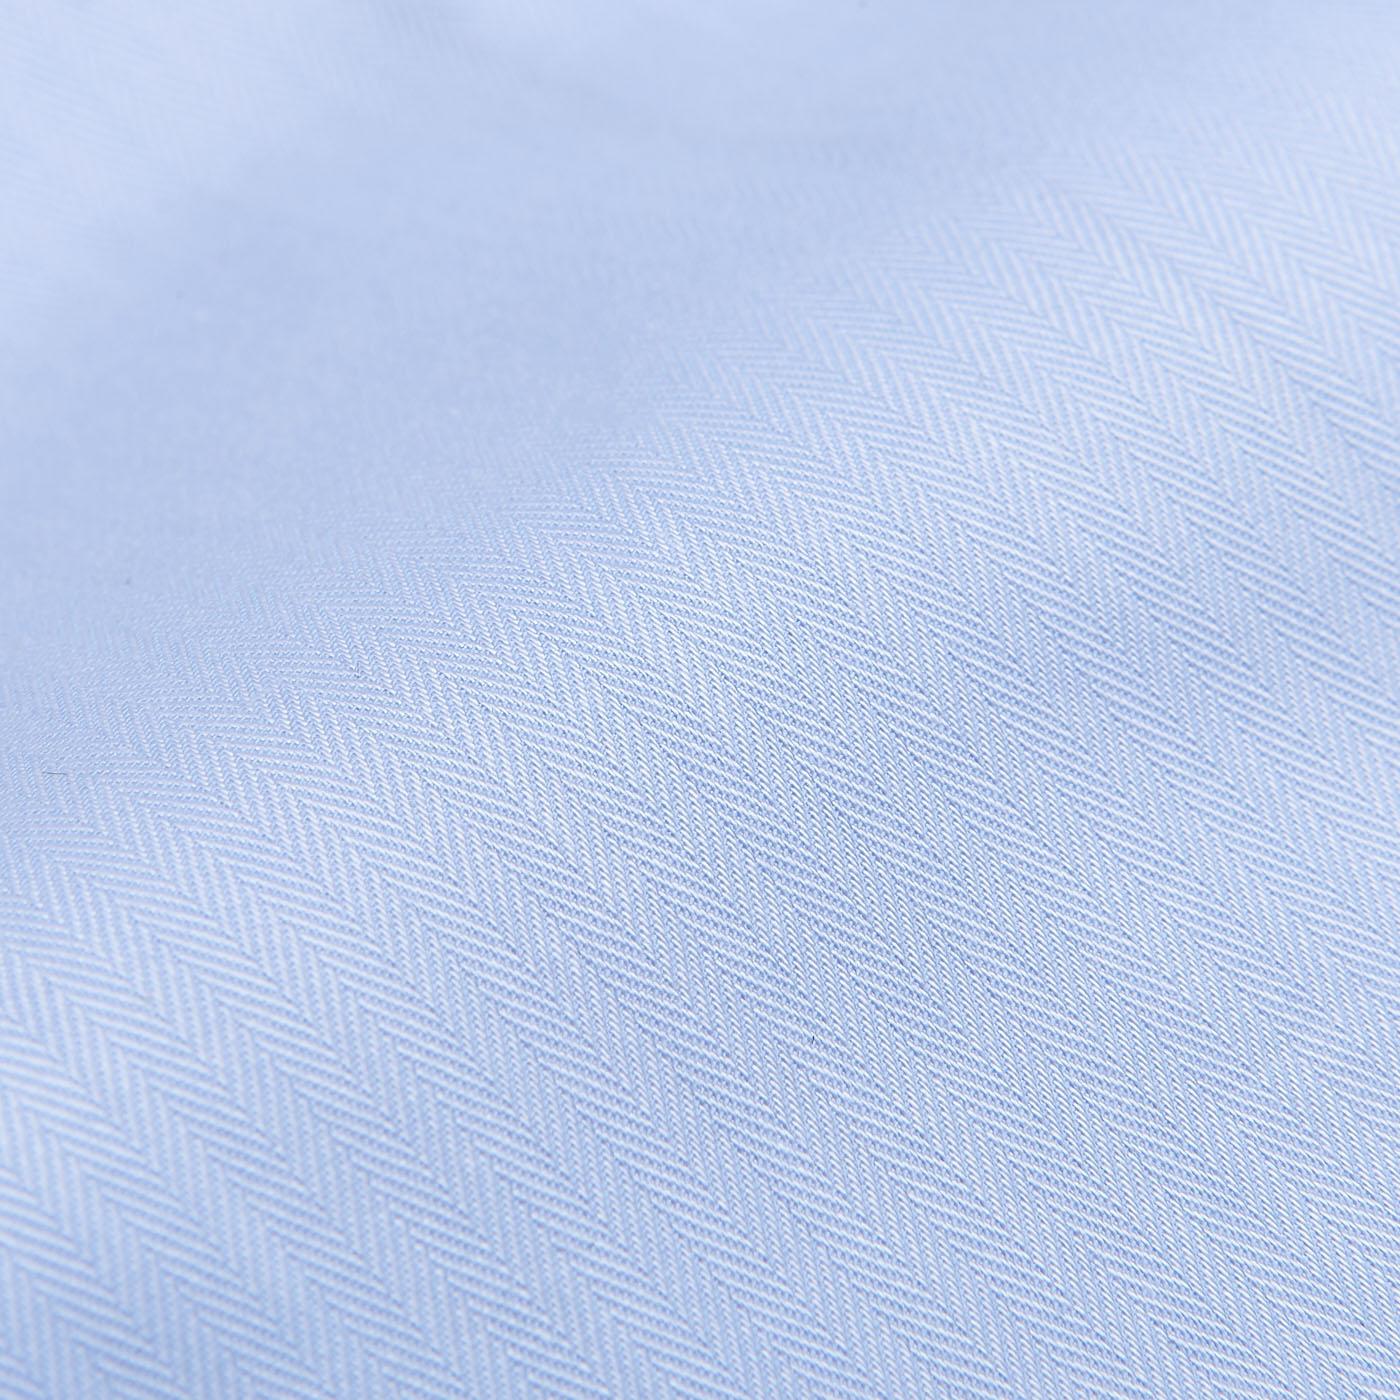 Mazzarelli Light Blue Slim Cutaway Herringbone Shirt Fabric